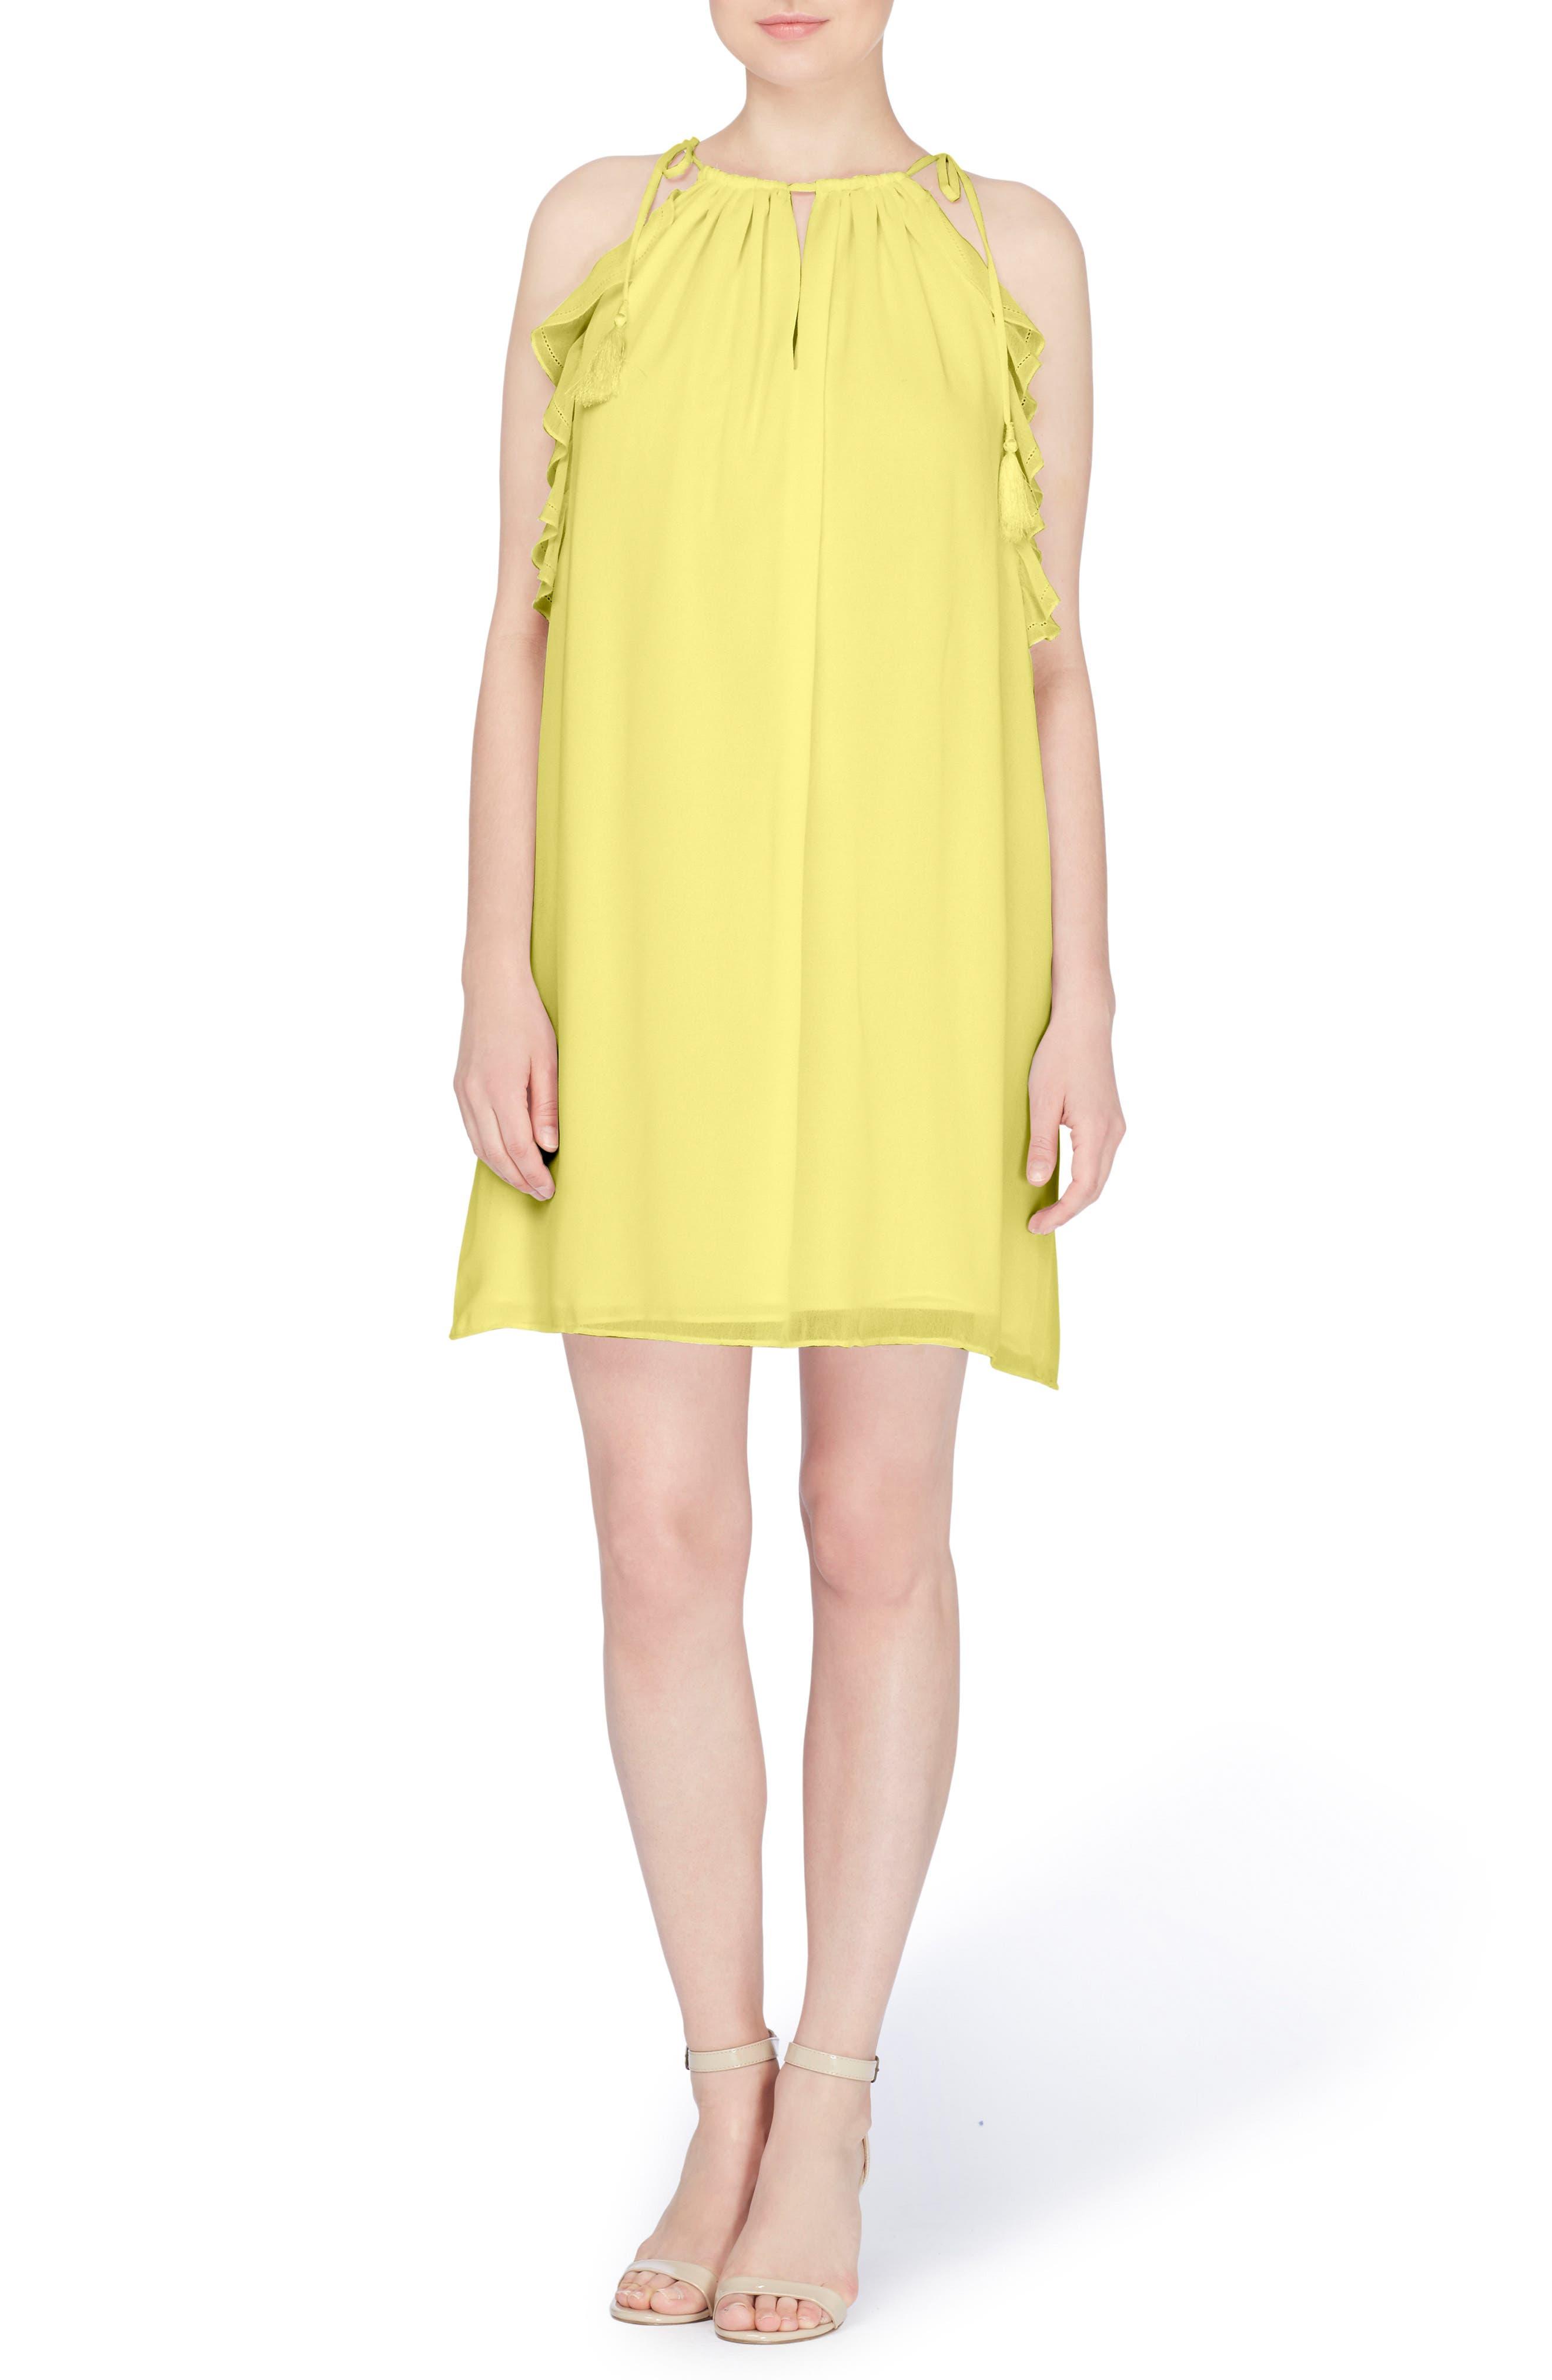 CATHERINE CATHERINE MALANDRINO Natalie Tie Shoulder Shift Dress